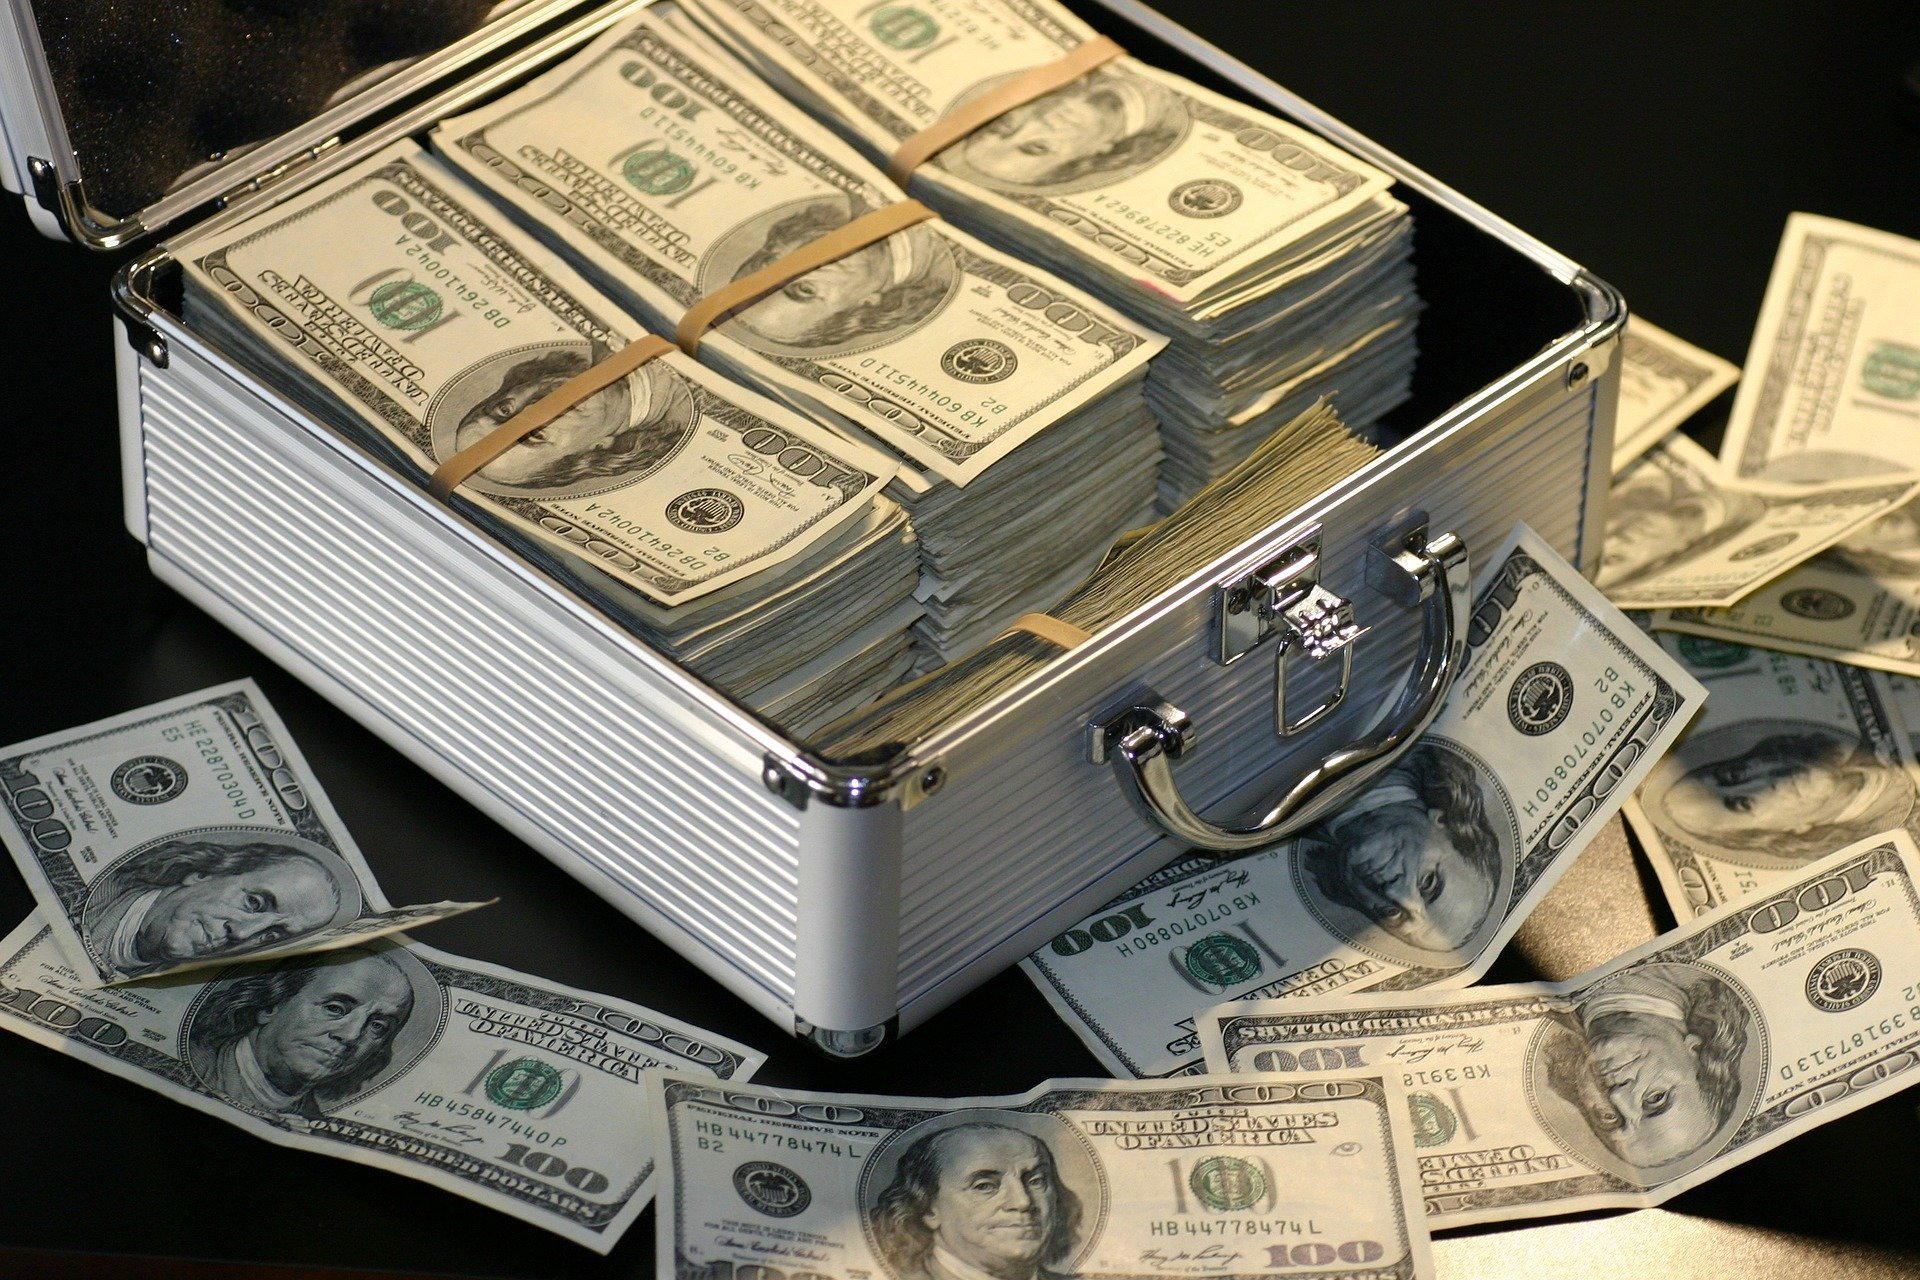 fintech-launches-3-cash-back-hmbradley-credit-card